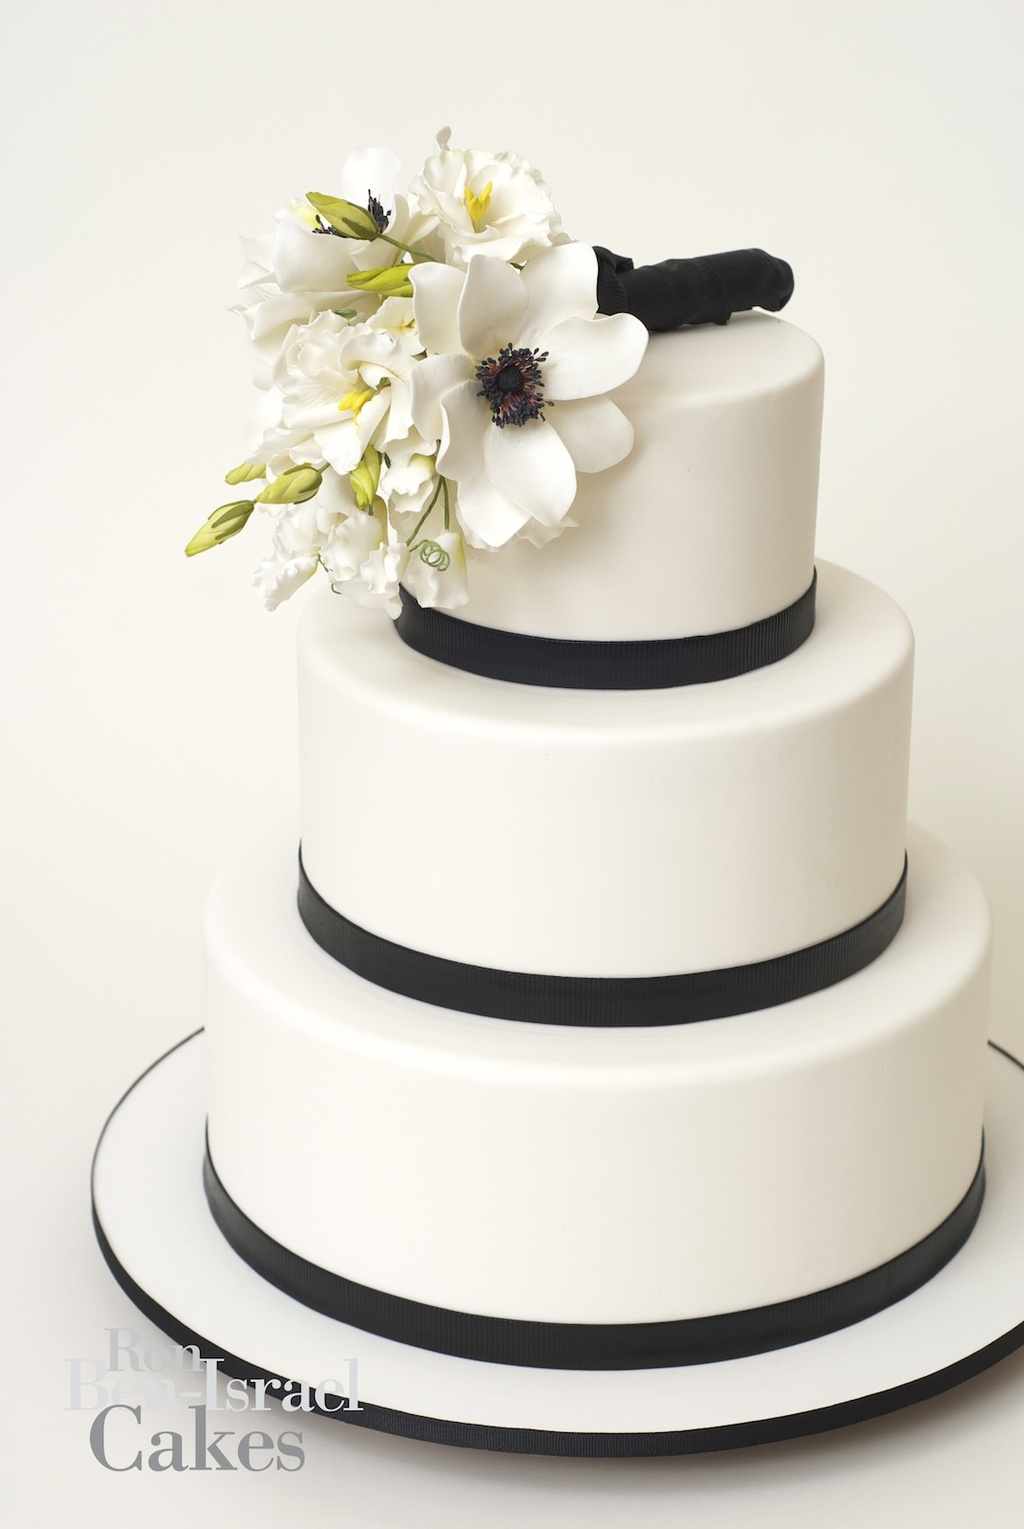 wedding-cake-inspiration-Ron-Ben-Isreal-wedding-cakes-white-black ...